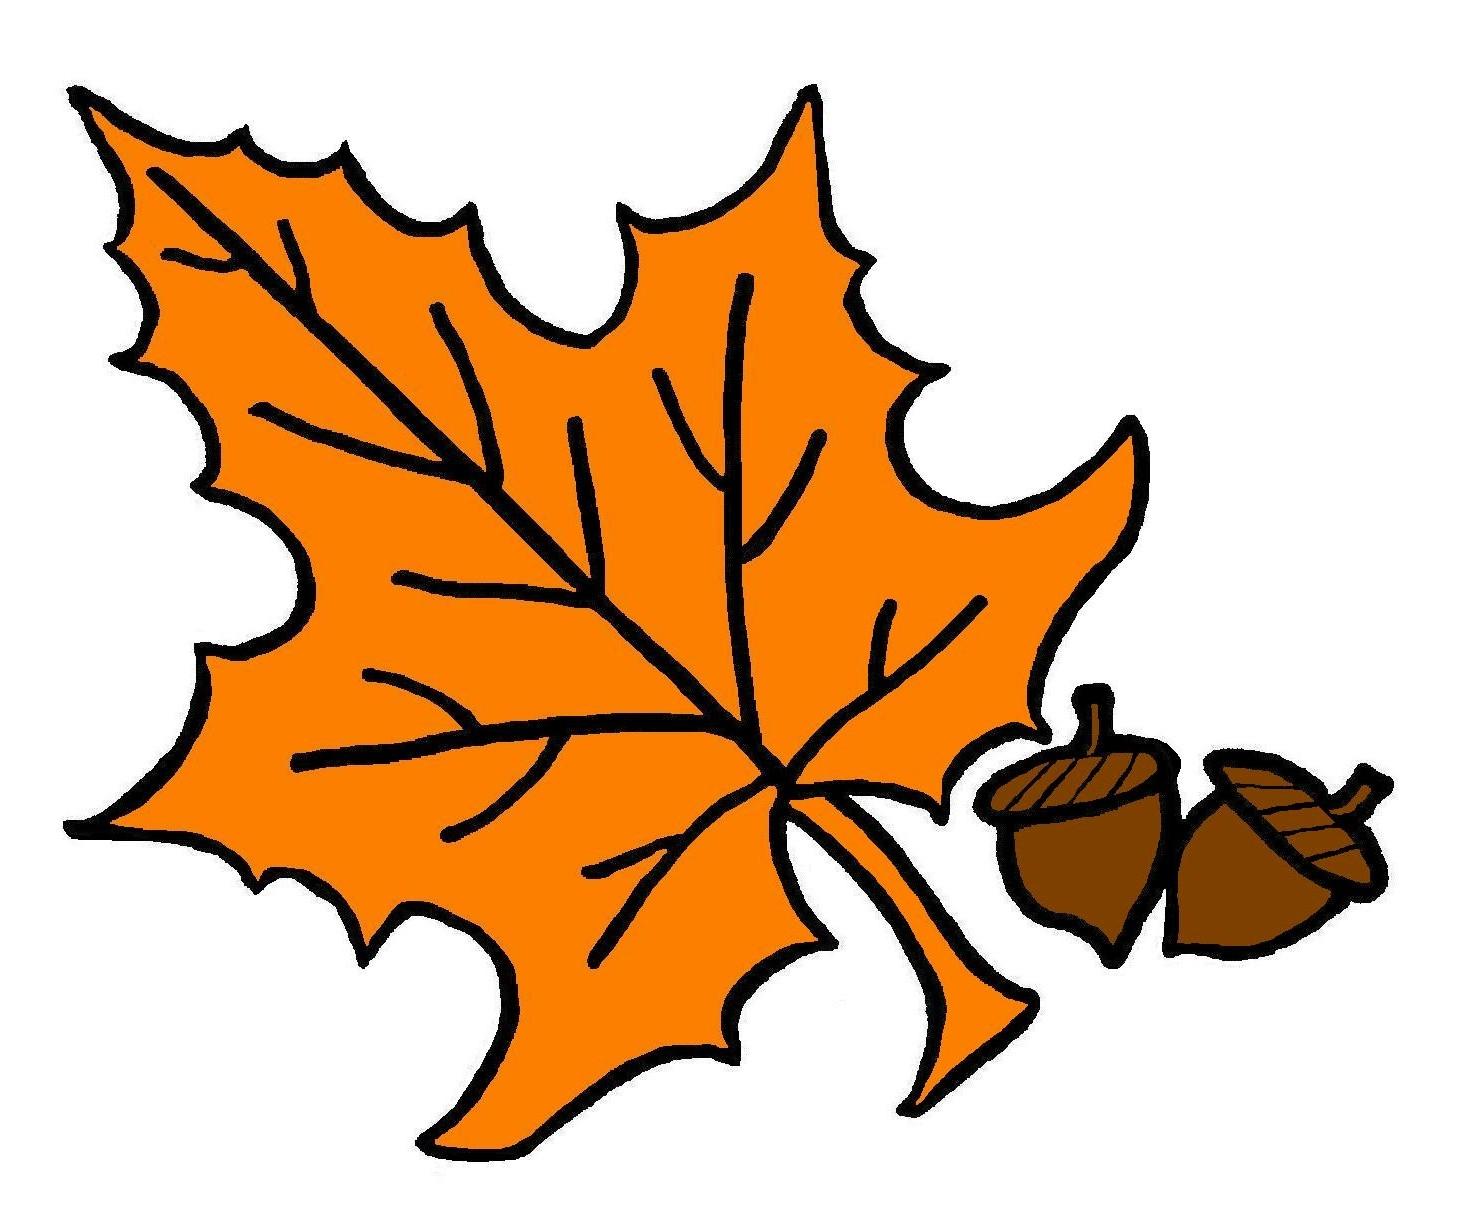 1457x1222 Leaf Clip Art Free Amp Look At Leaf Clip Art Clip Art Images